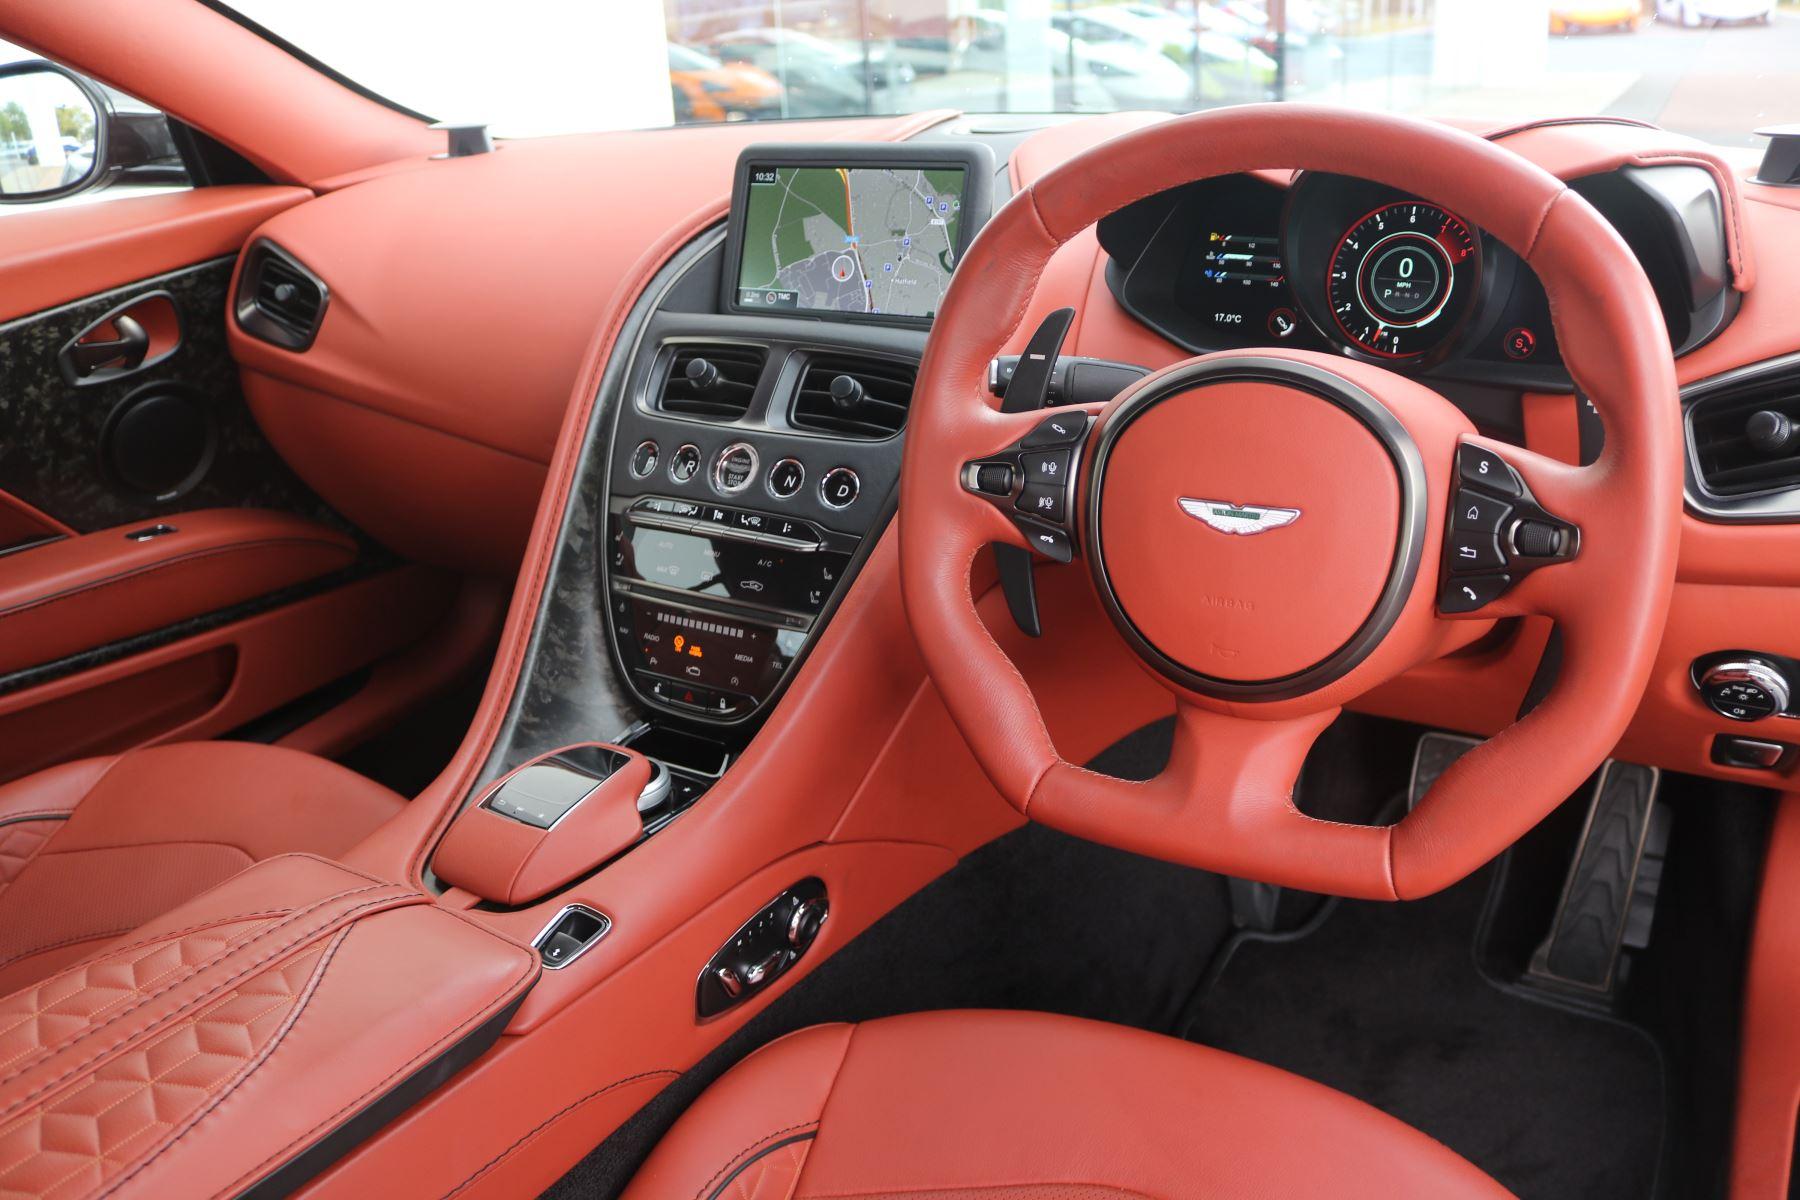 Aston Martin DBS V12 Superleggera 2dr Touchtronic image 17